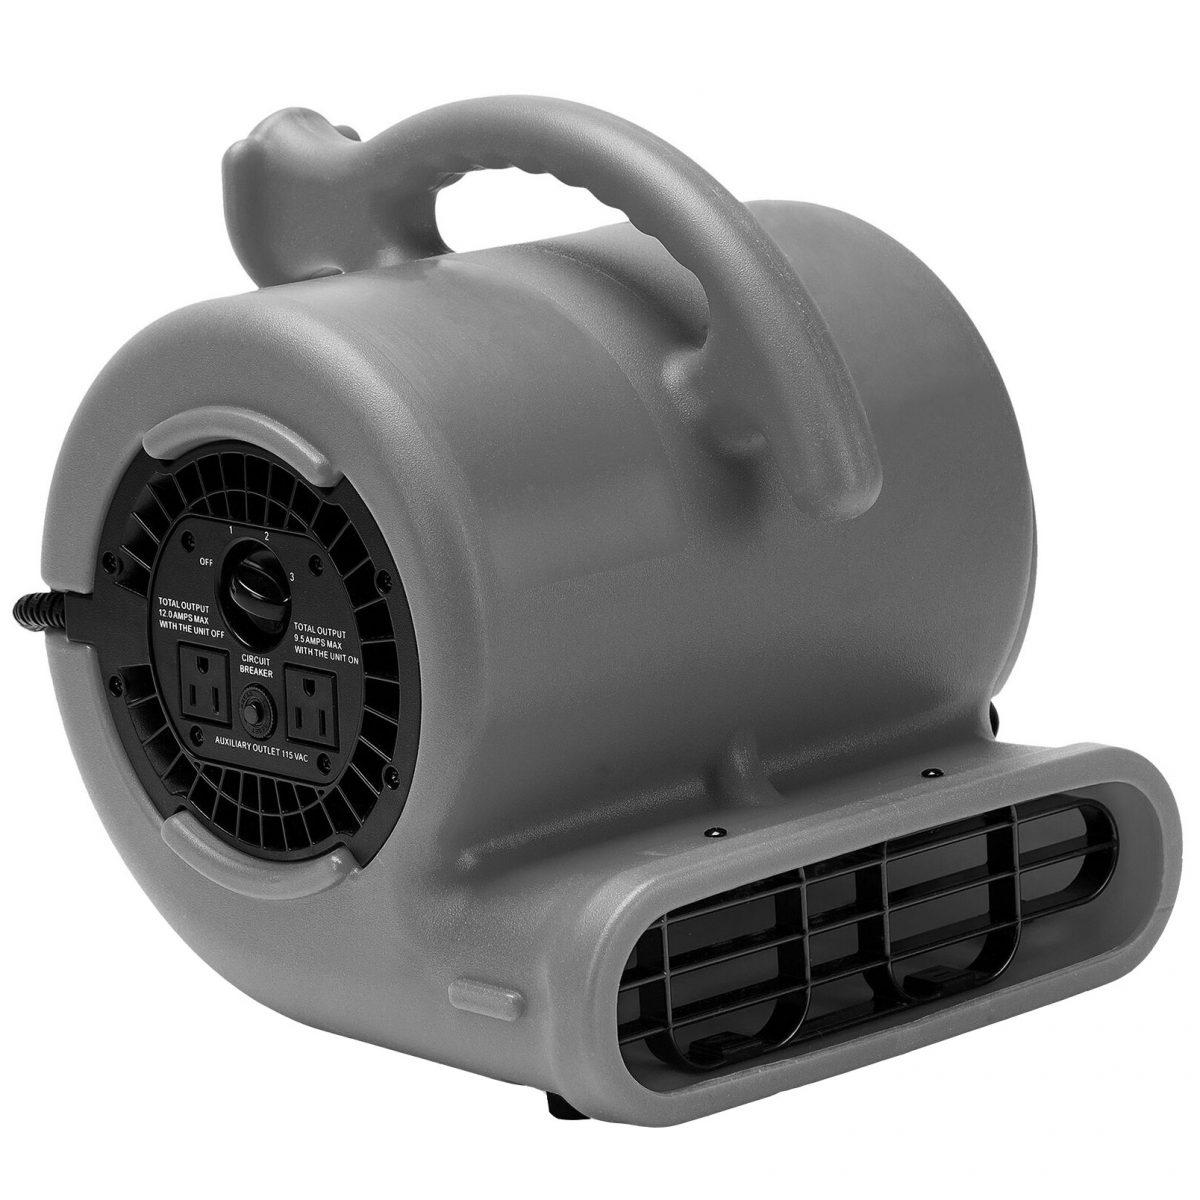 Hawk BVP25D Compact Air Mover Carpet Dryer